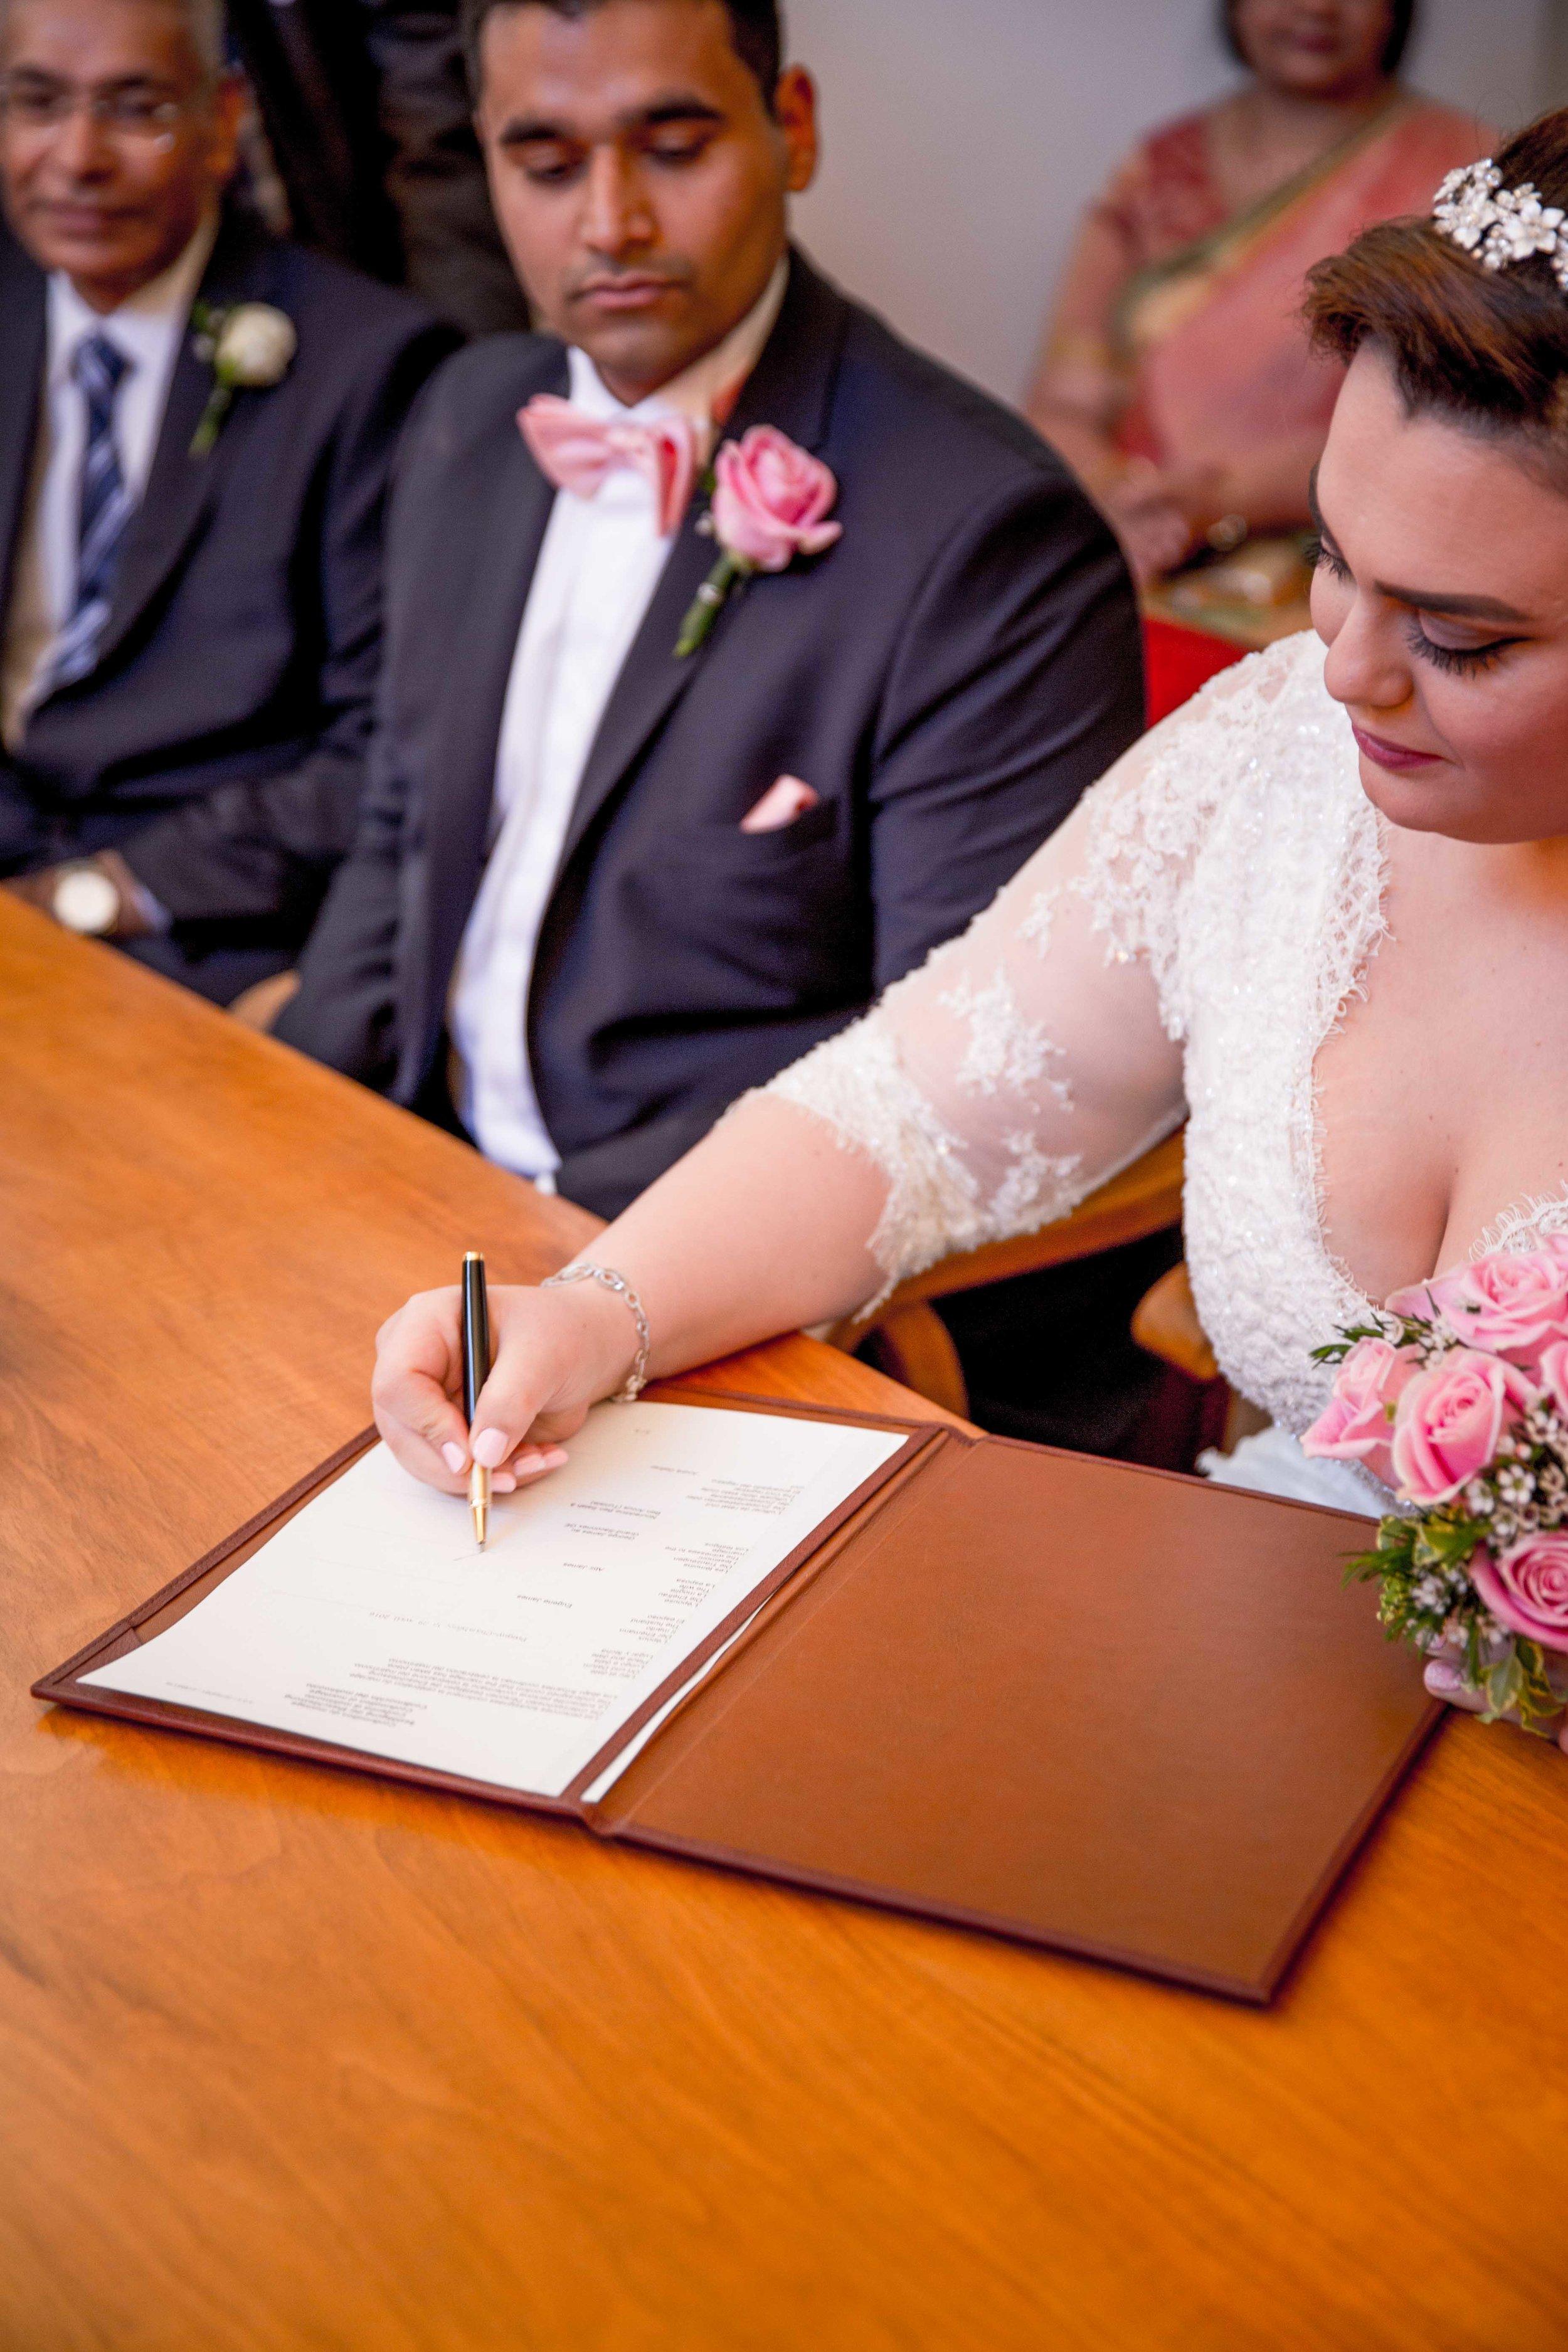 parc-des-eaux-vives-destination-wedding-photographer-geneva-switzerland-natalia-smith-photography-25.jpg